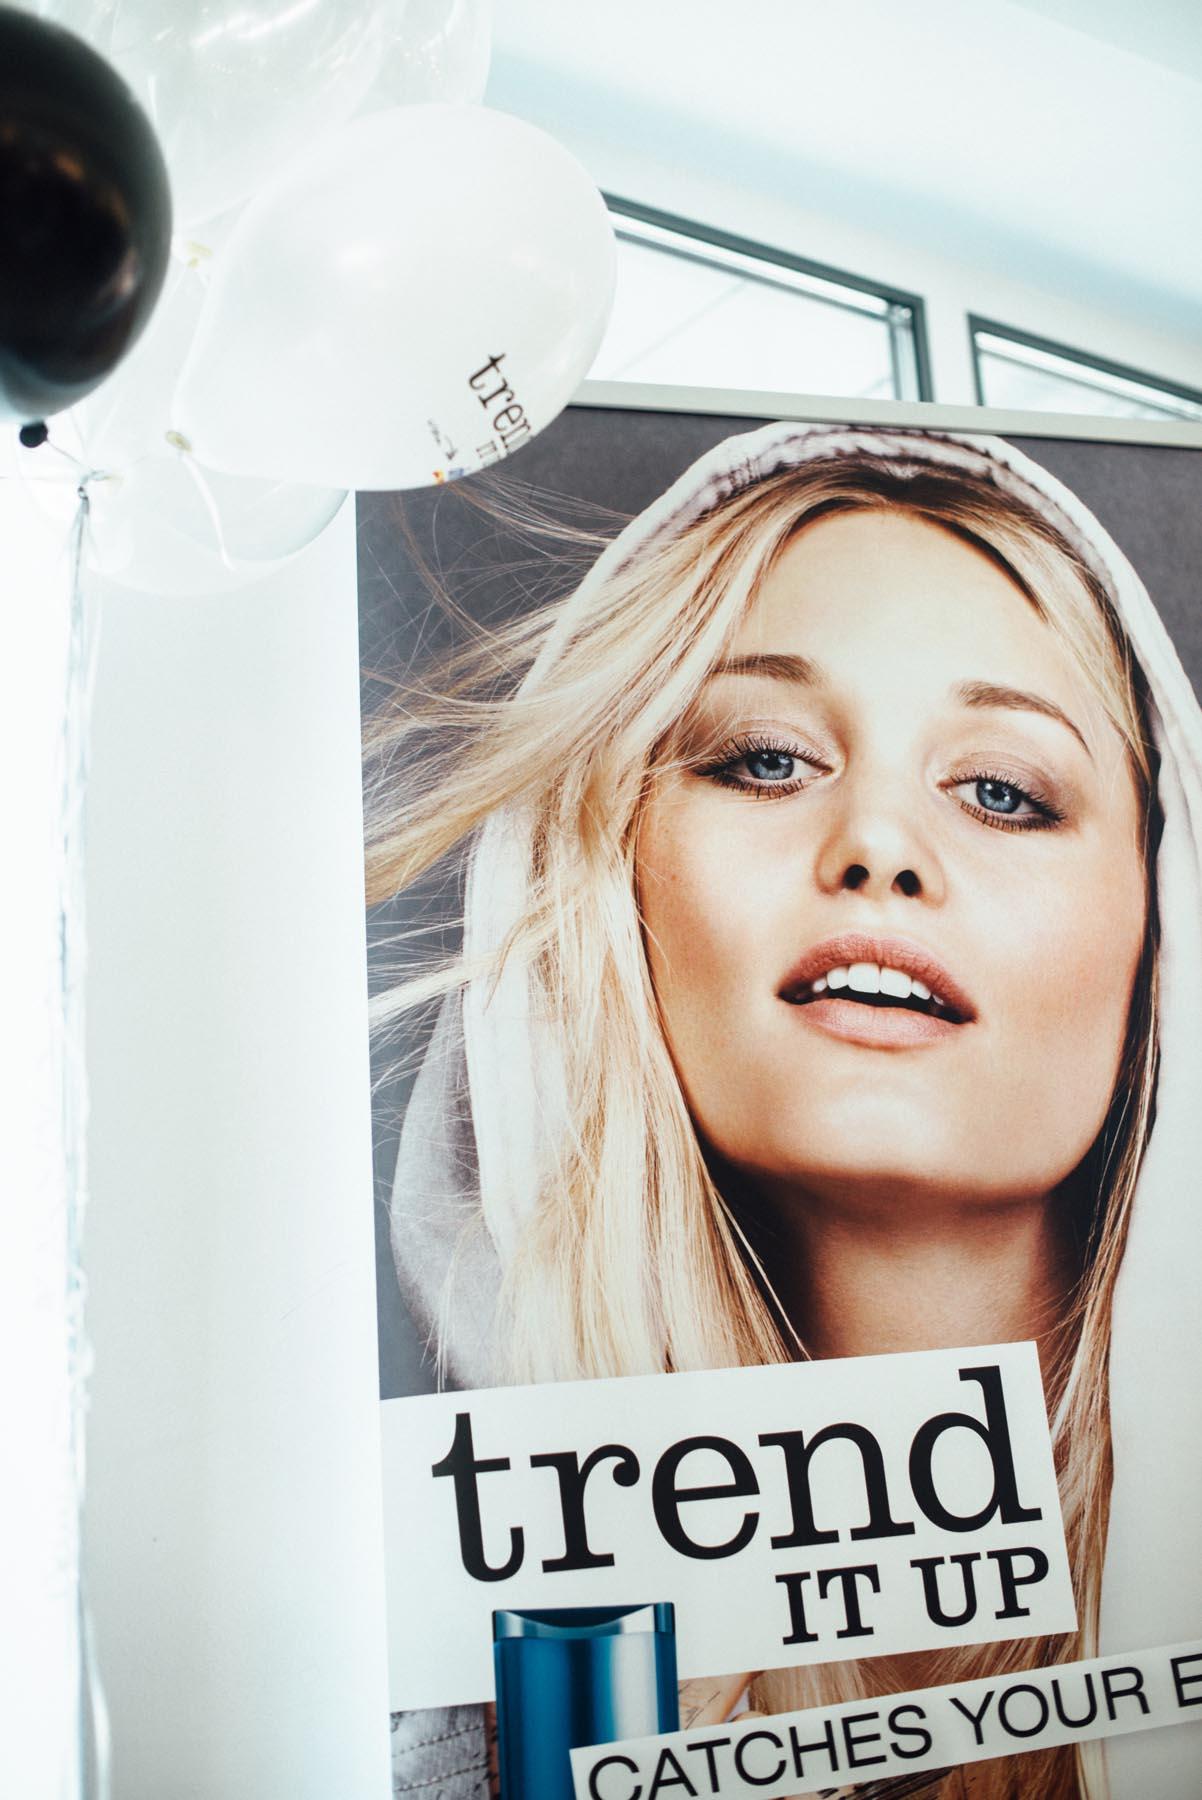 16-Kiamisu-Modeblog-Fashionblog_Kassel_dm trend it up_event_neue theke_neuheiten_ab märz_neuprodukte-11_final